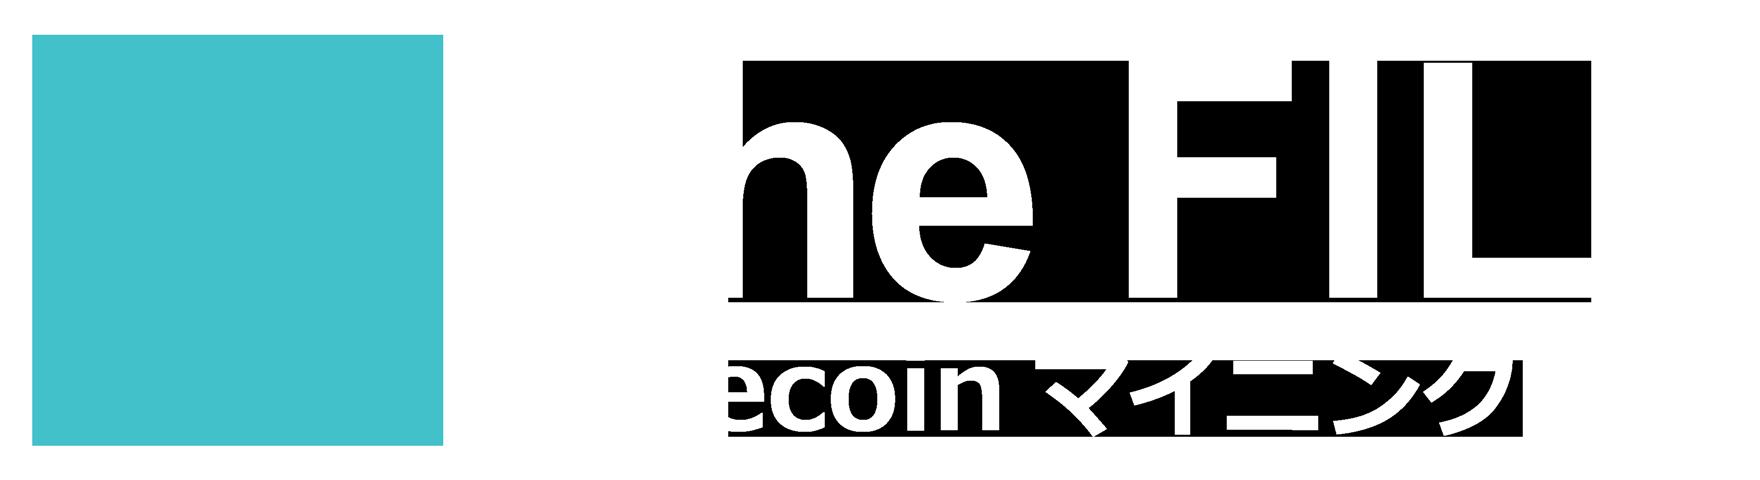 「The FIL」 Filecoin(ファイルコイン)マイニング